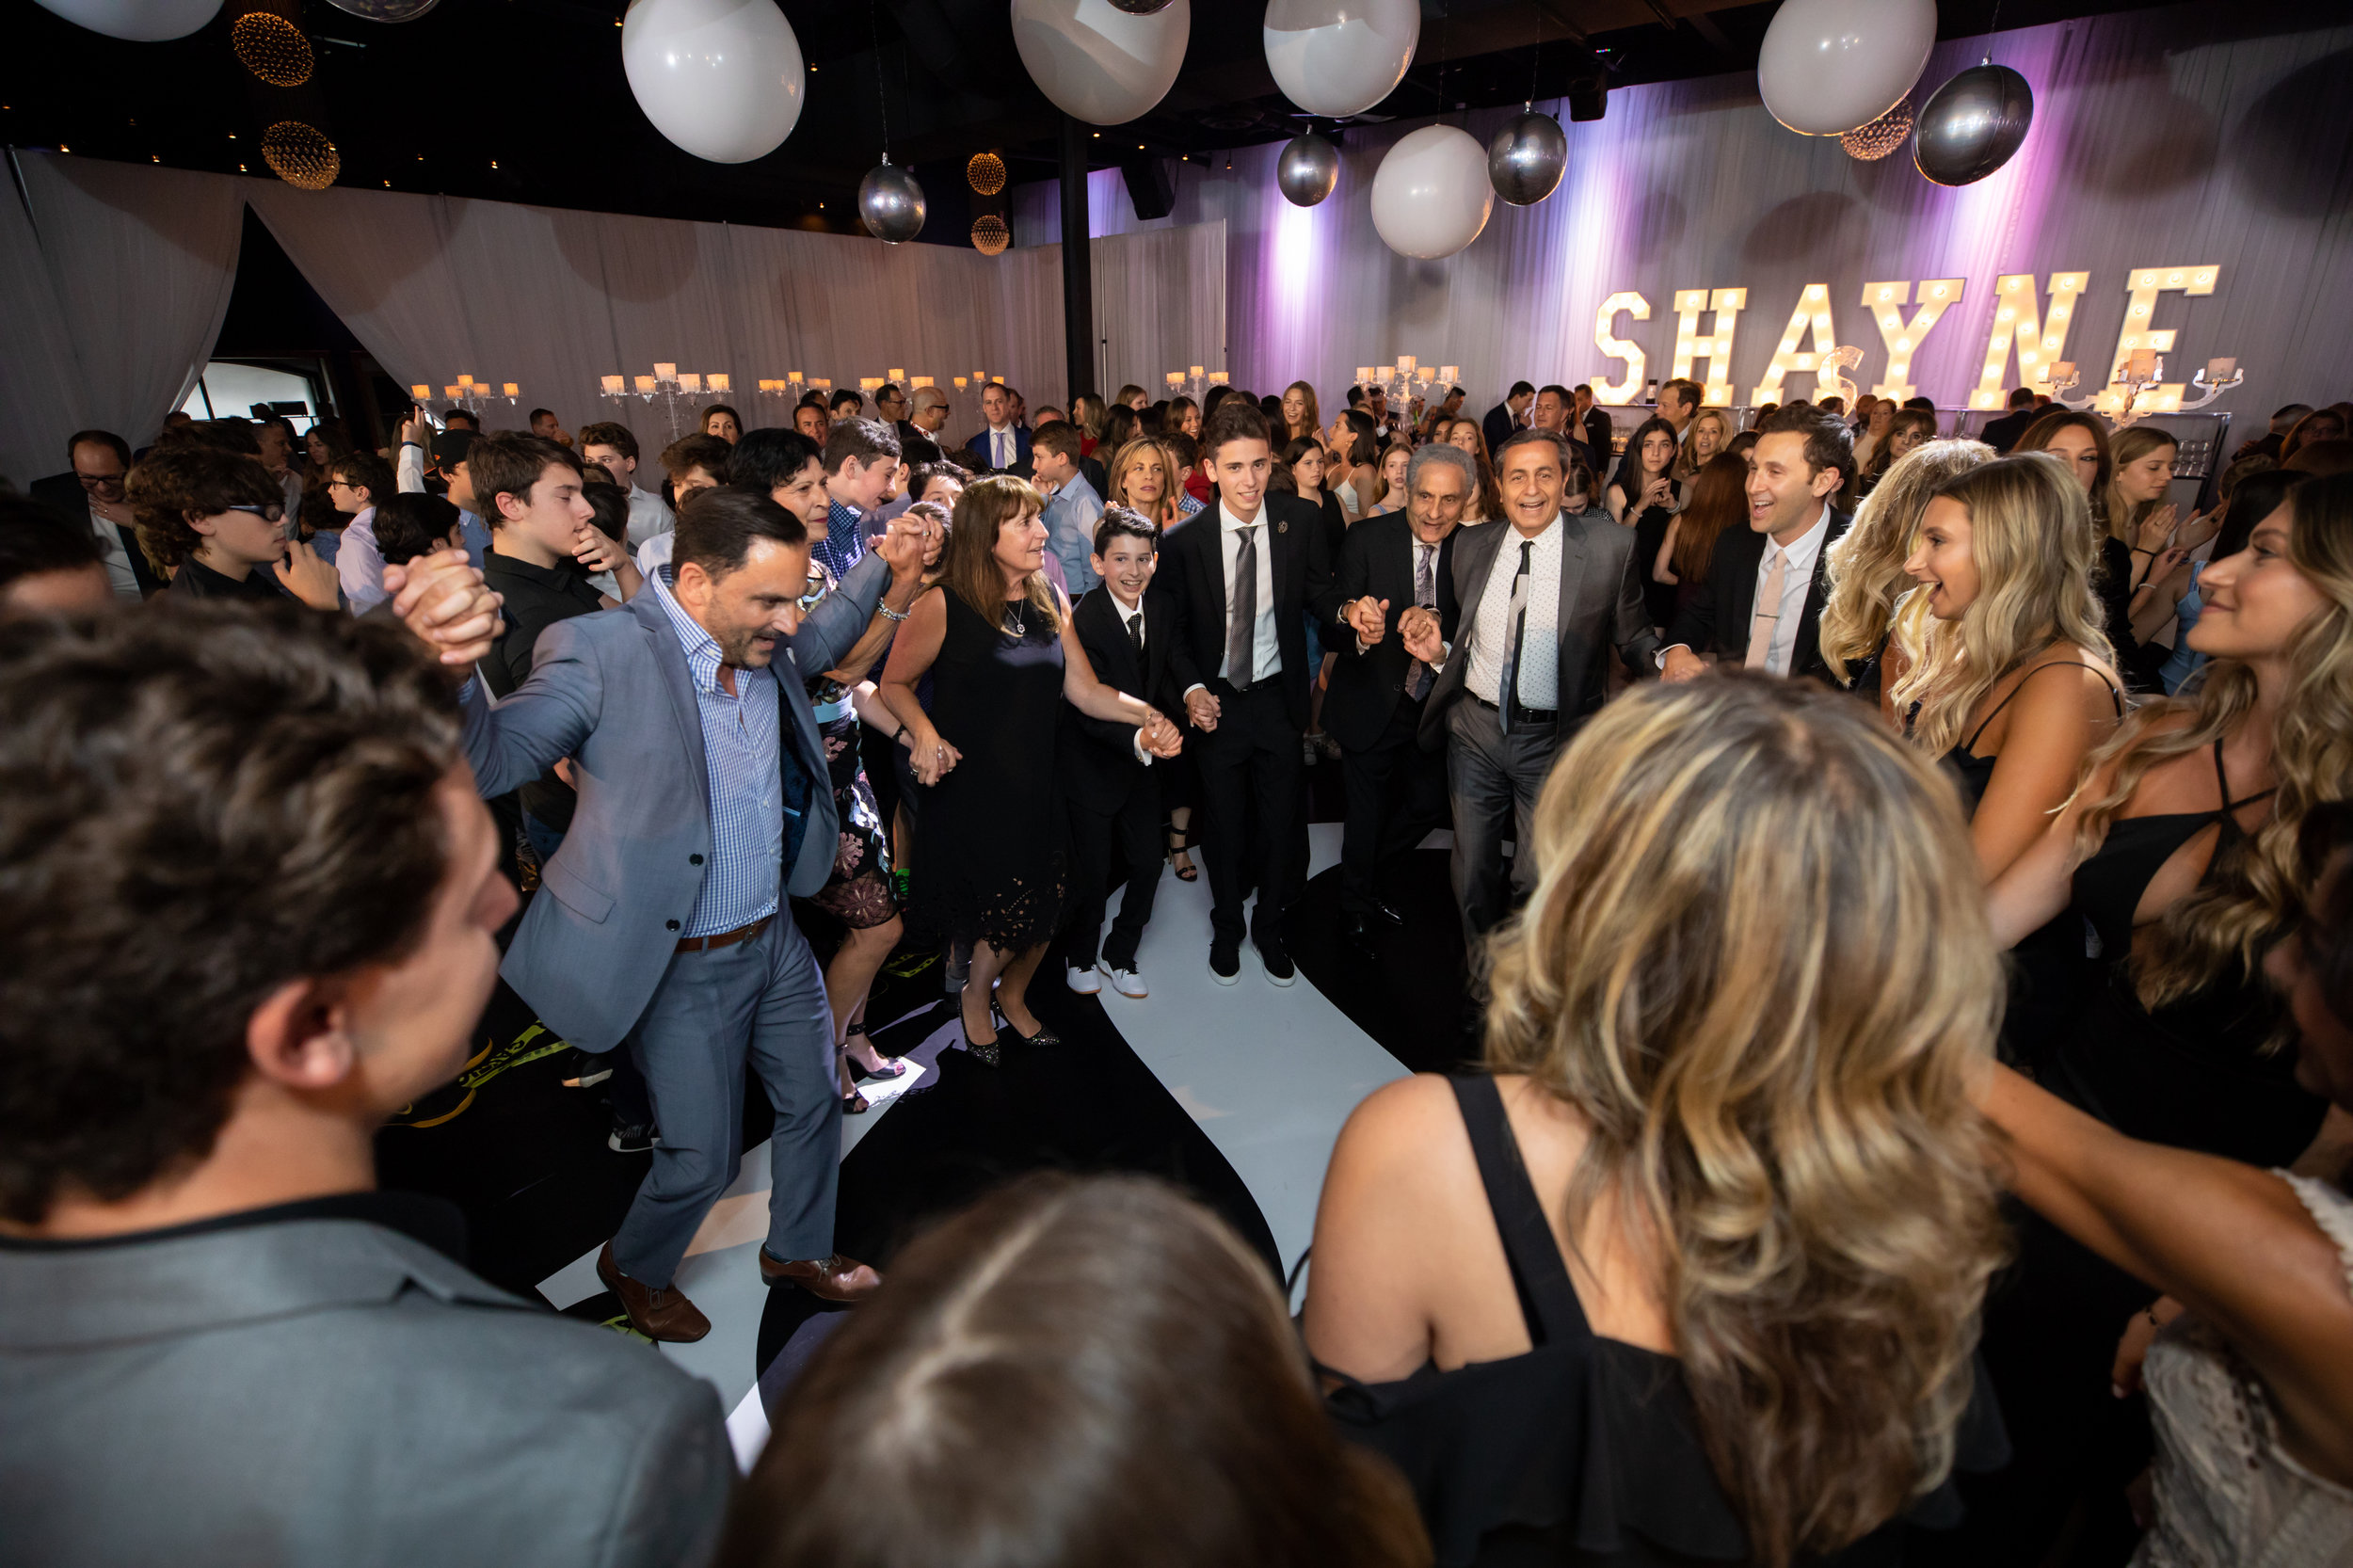 Shayne - Party-0456.jpg